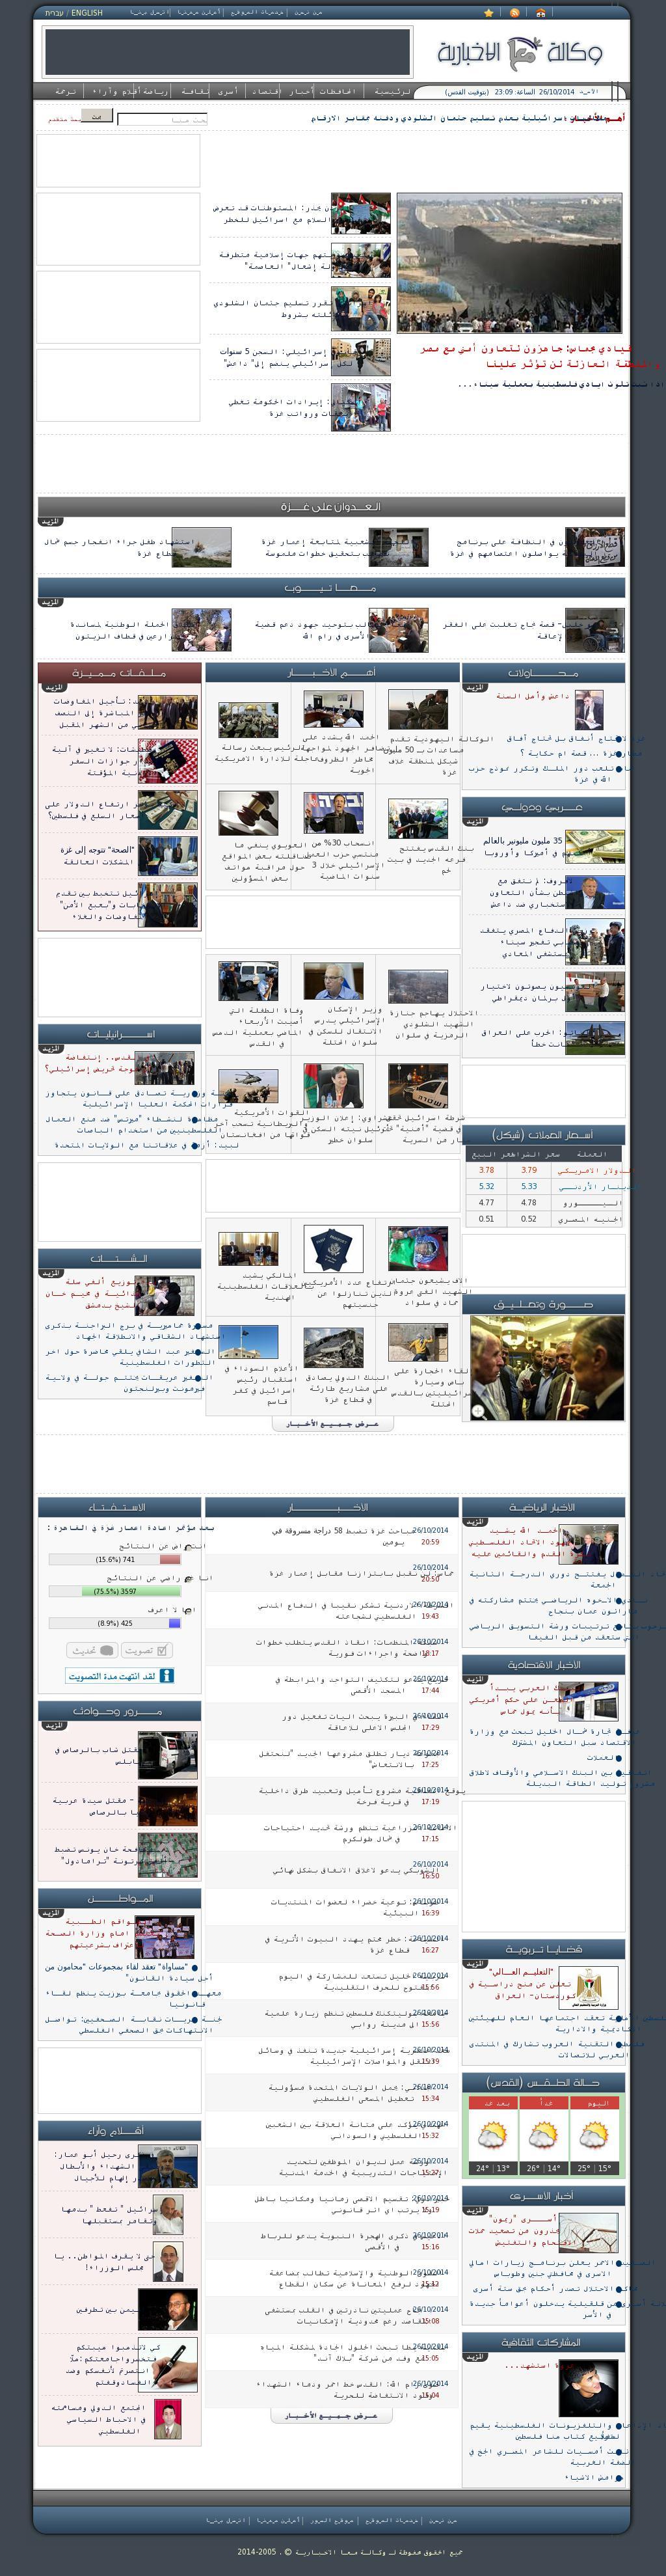 Ma'an News at Sunday Oct. 26, 2014, 9:09 p.m. UTC